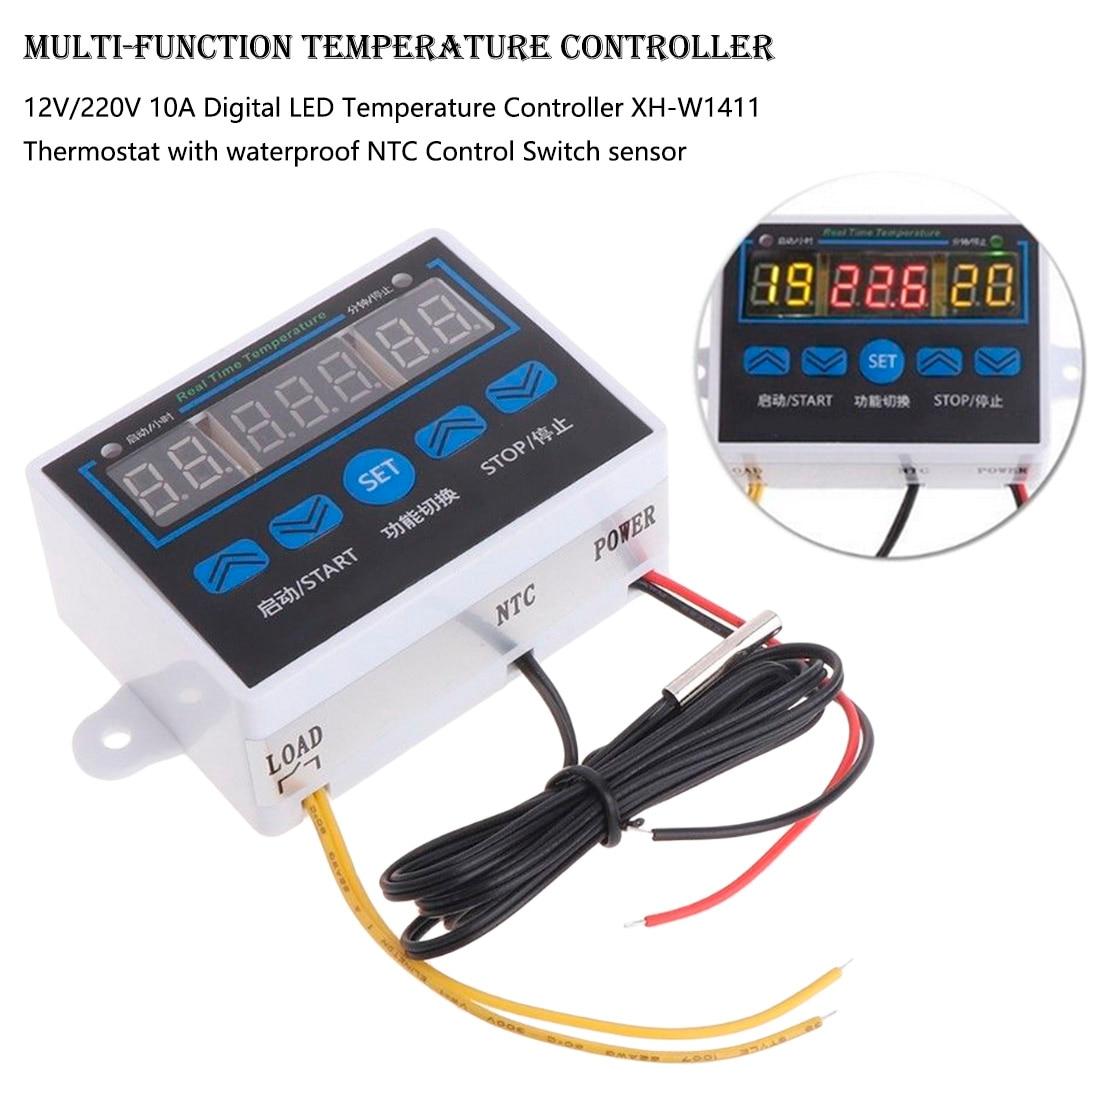 Termostato Digital Controlador de Temperatura Controle de Temperatura Switch-19 ~ Sensor12V 220 V 10A 99 com NTC À Prova D' Água